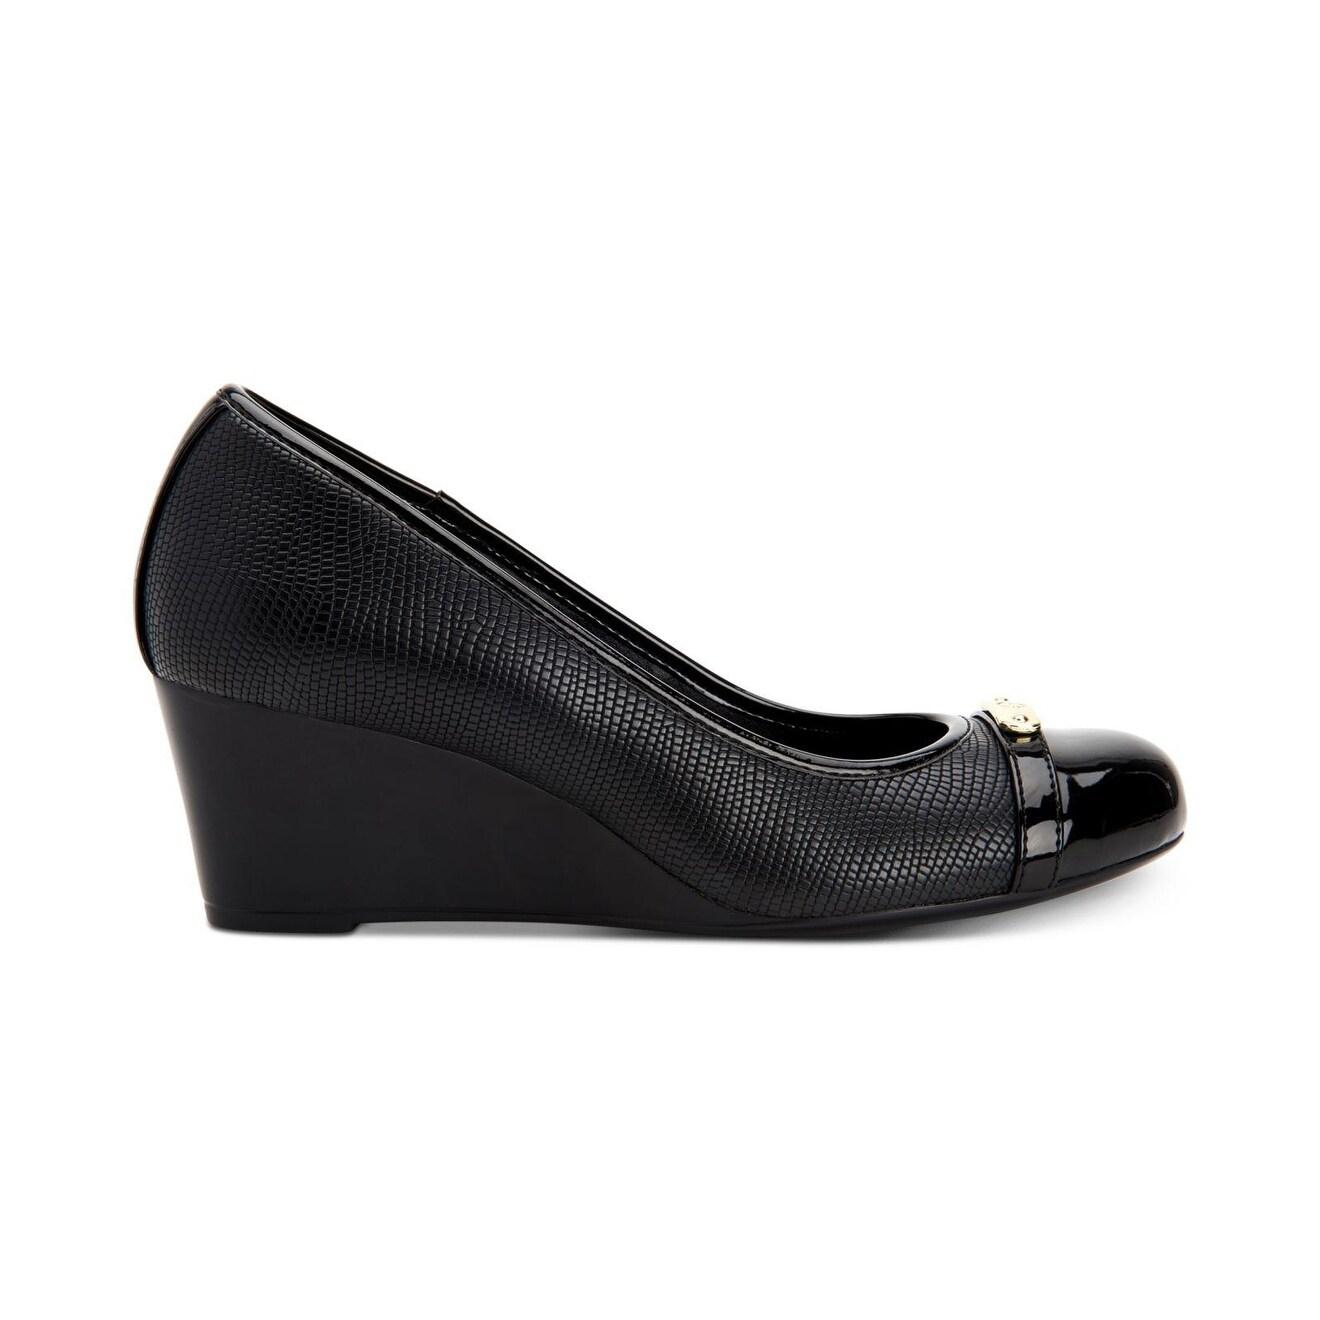 Giani Bernini Women/'s Shoes Tahoee Cap Toe Wedge Pumps